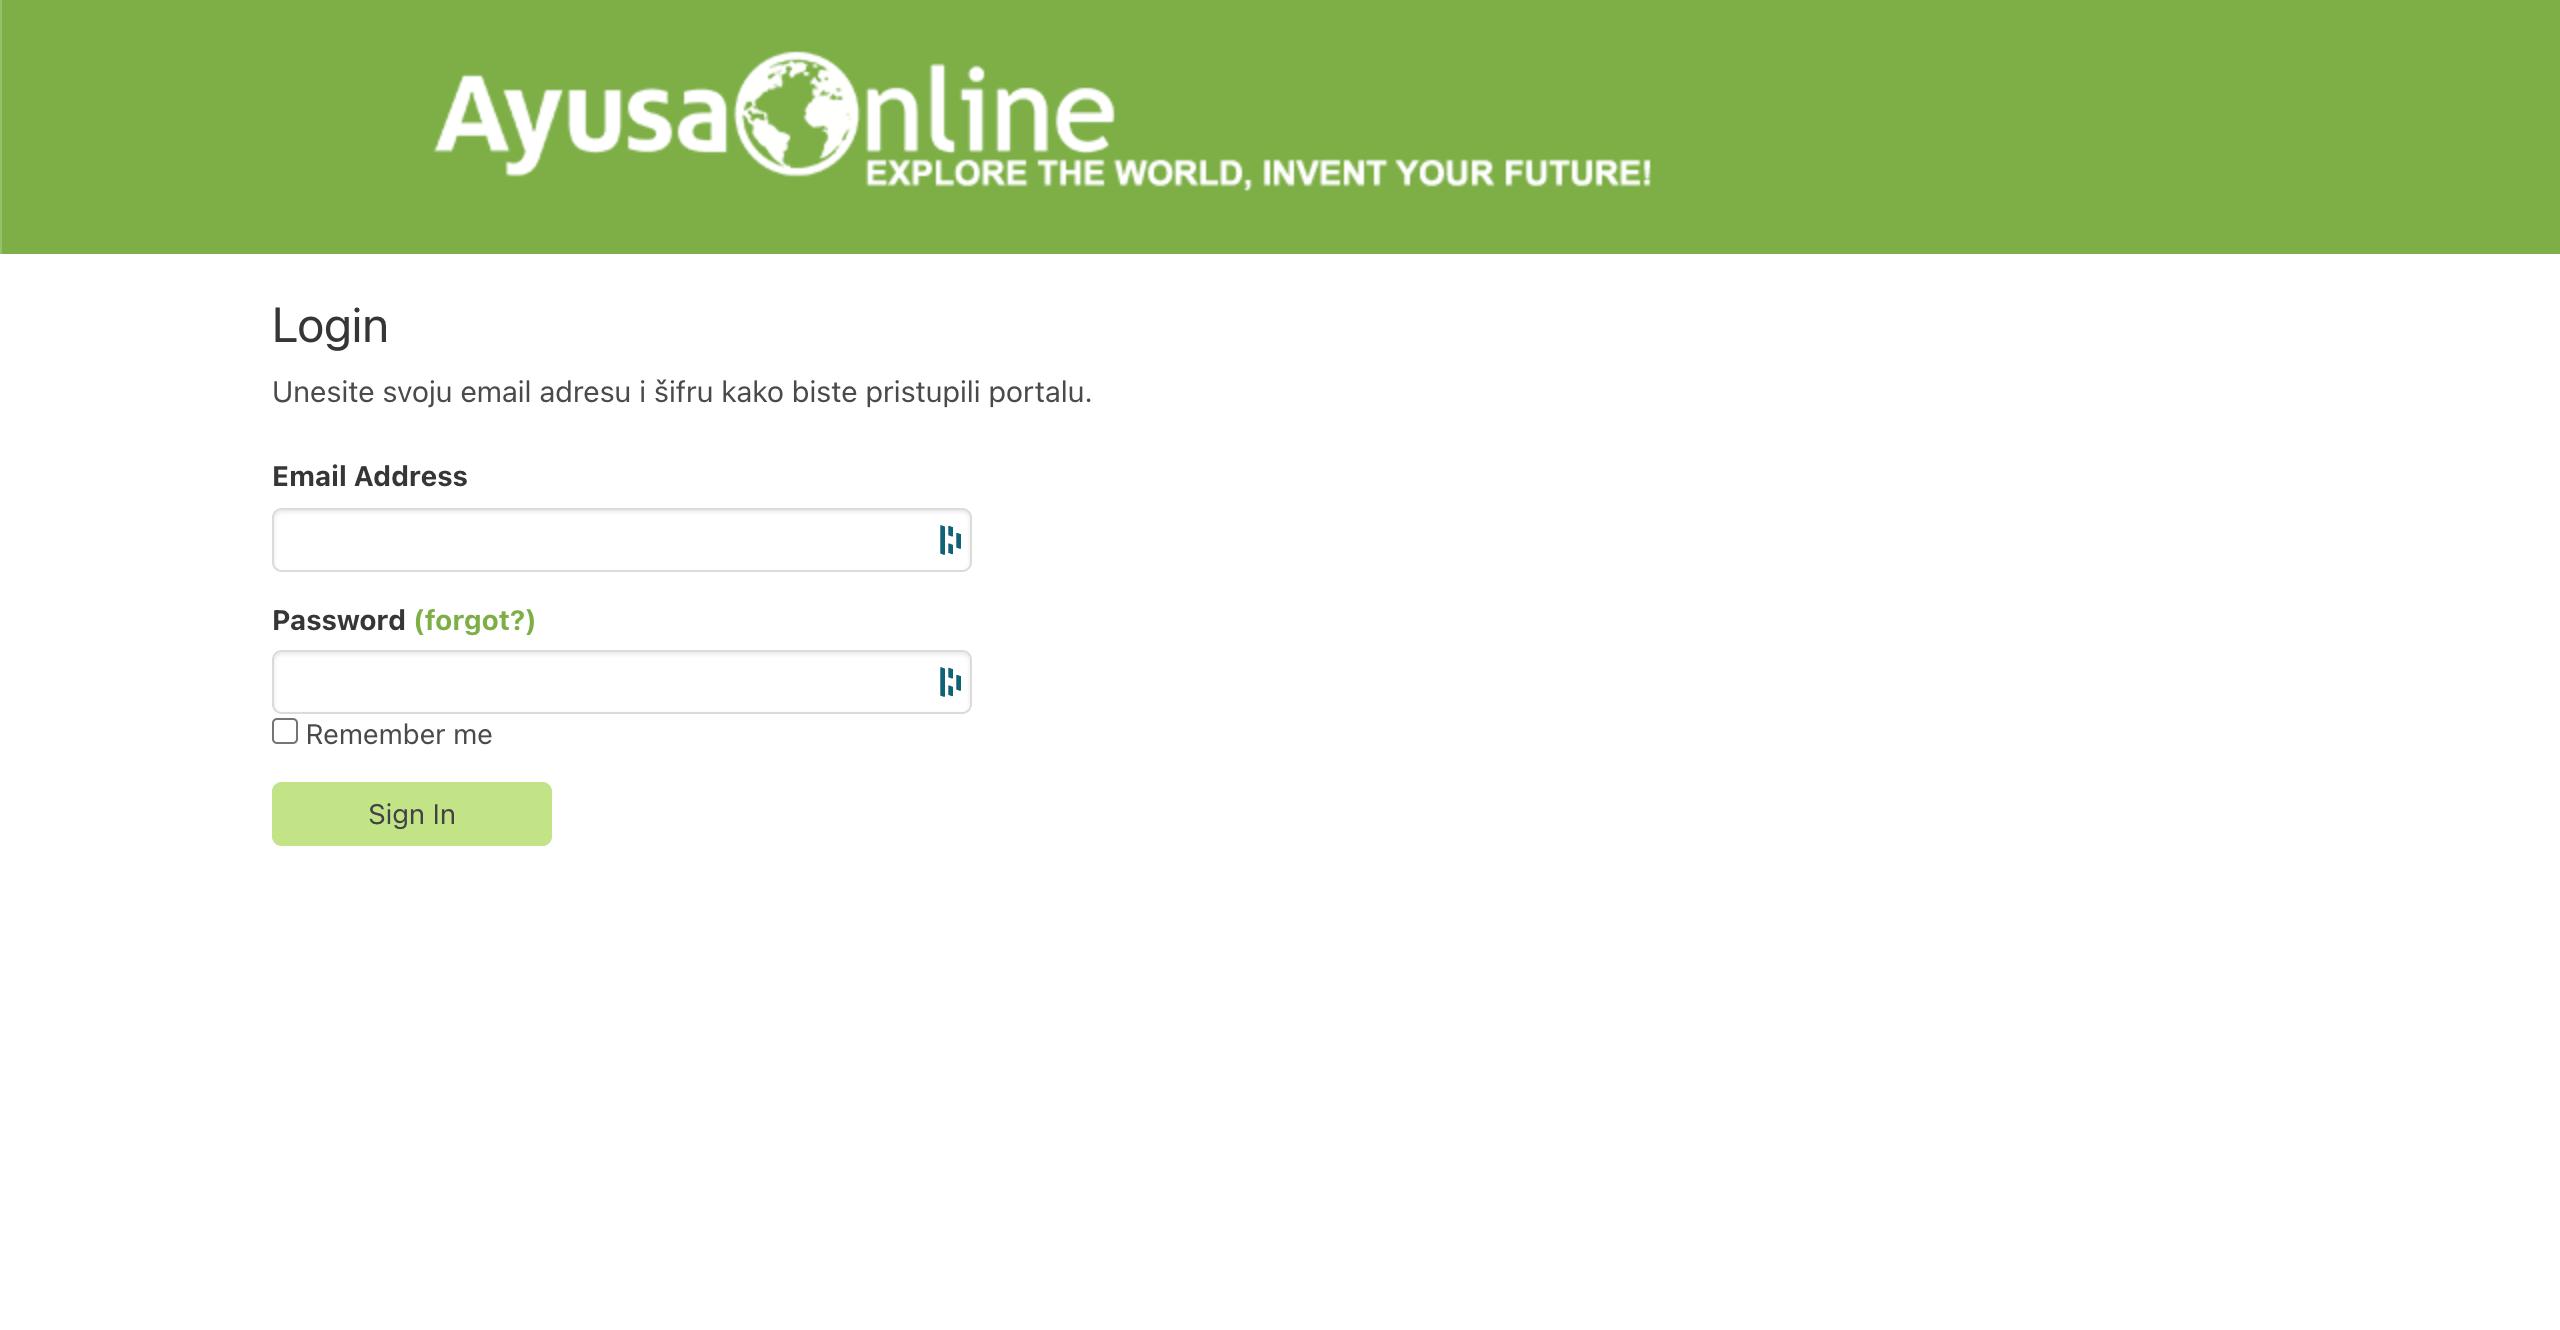 Ayusa Online